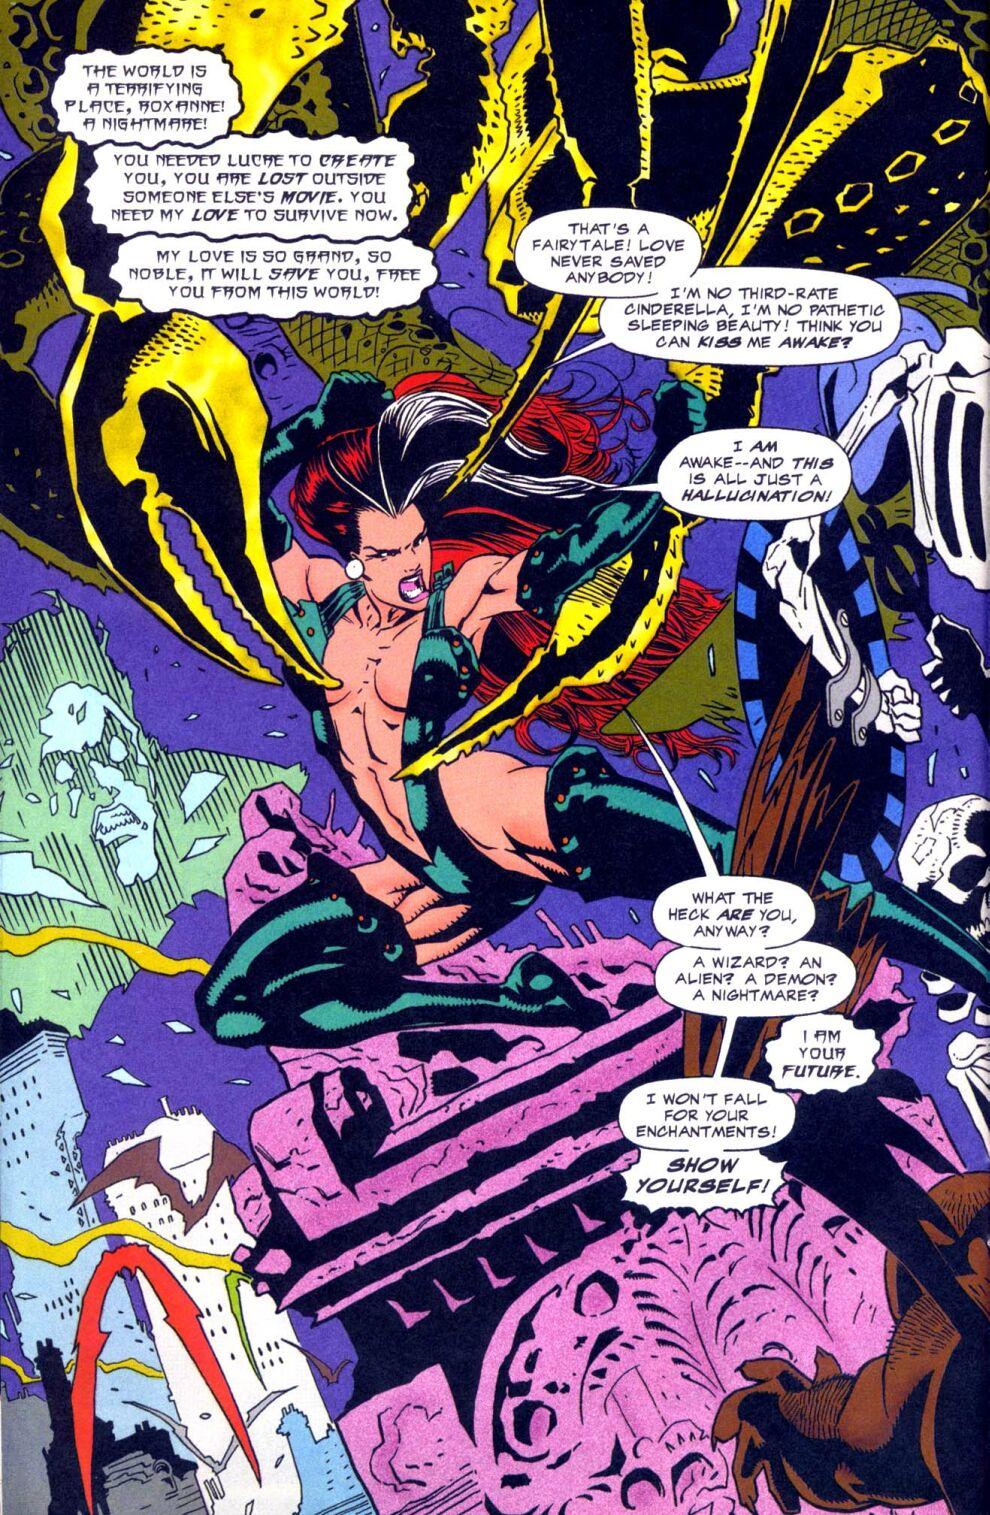 Read online Nightmare comic -  Issue #4 - 9